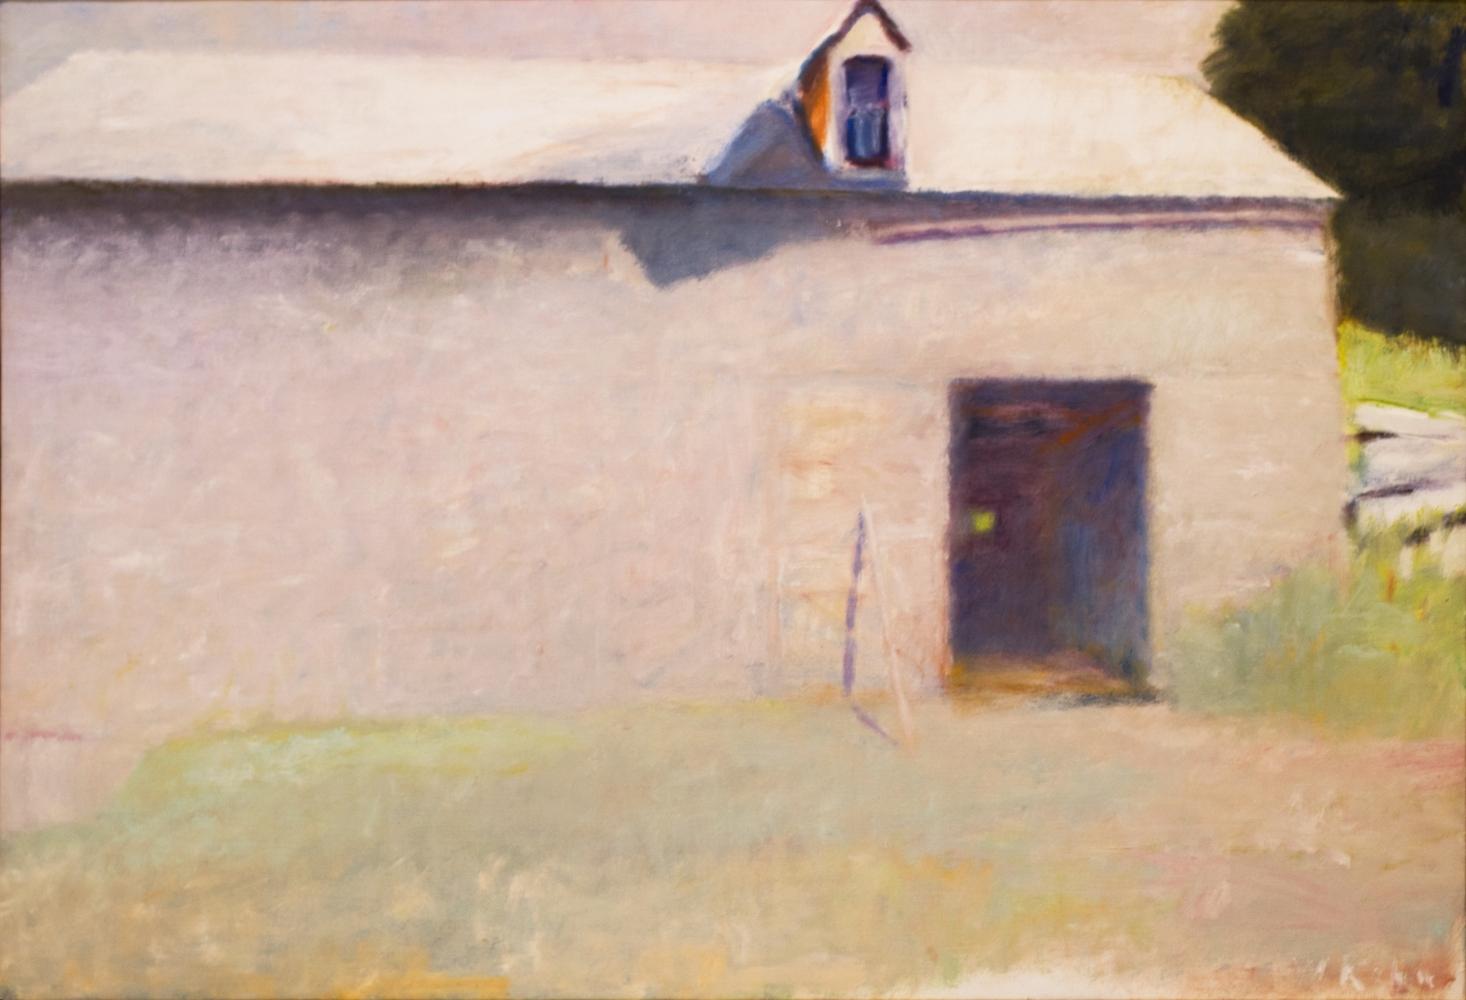 Wolf Kahn, In Praise of Pink, Oil painting, 36 x 52 inches Wolf Kahn art for sale,  Wolf Kahn Oil Paintings, Wolf Kahn barns